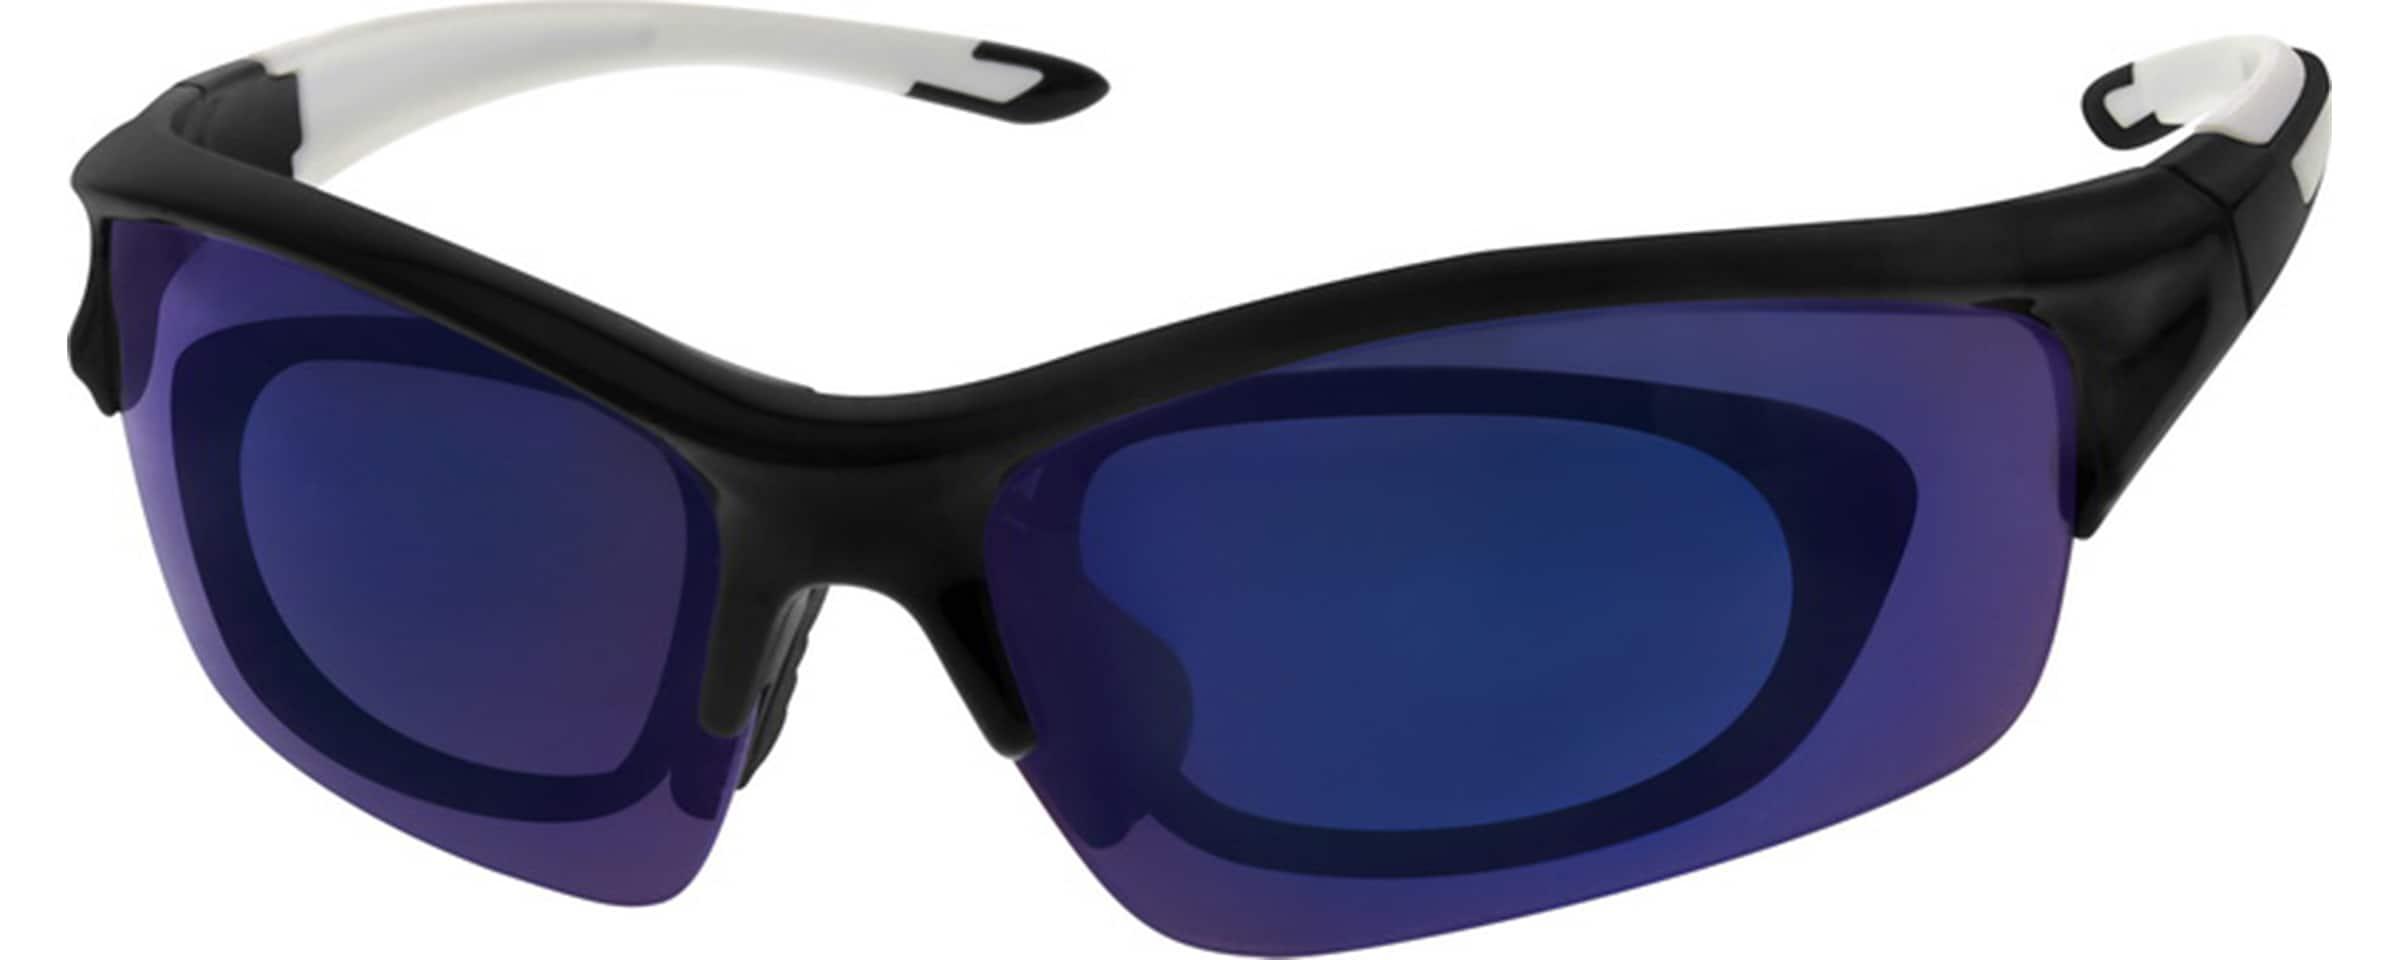 WomenHalf RimAcetate/PlasticEyeglasses #707021